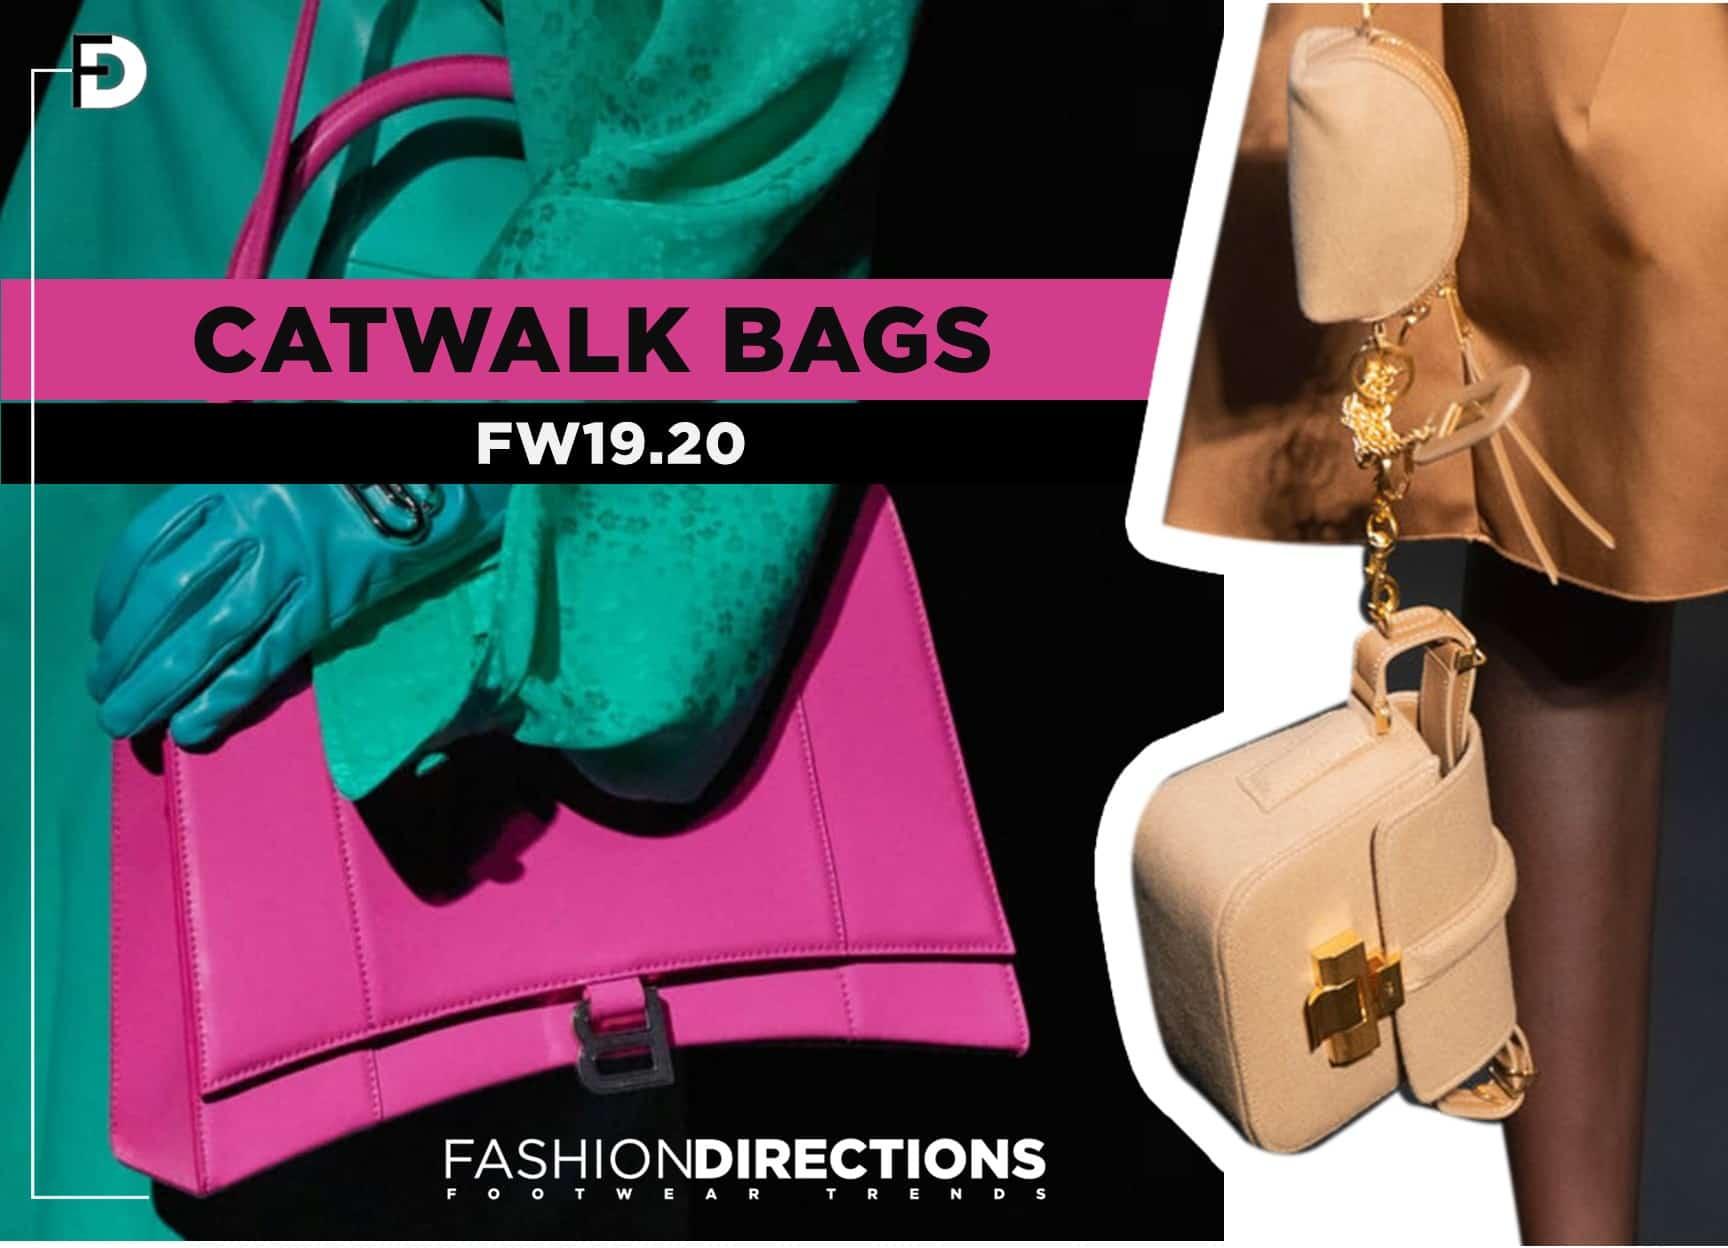 FW19.20 bags 1